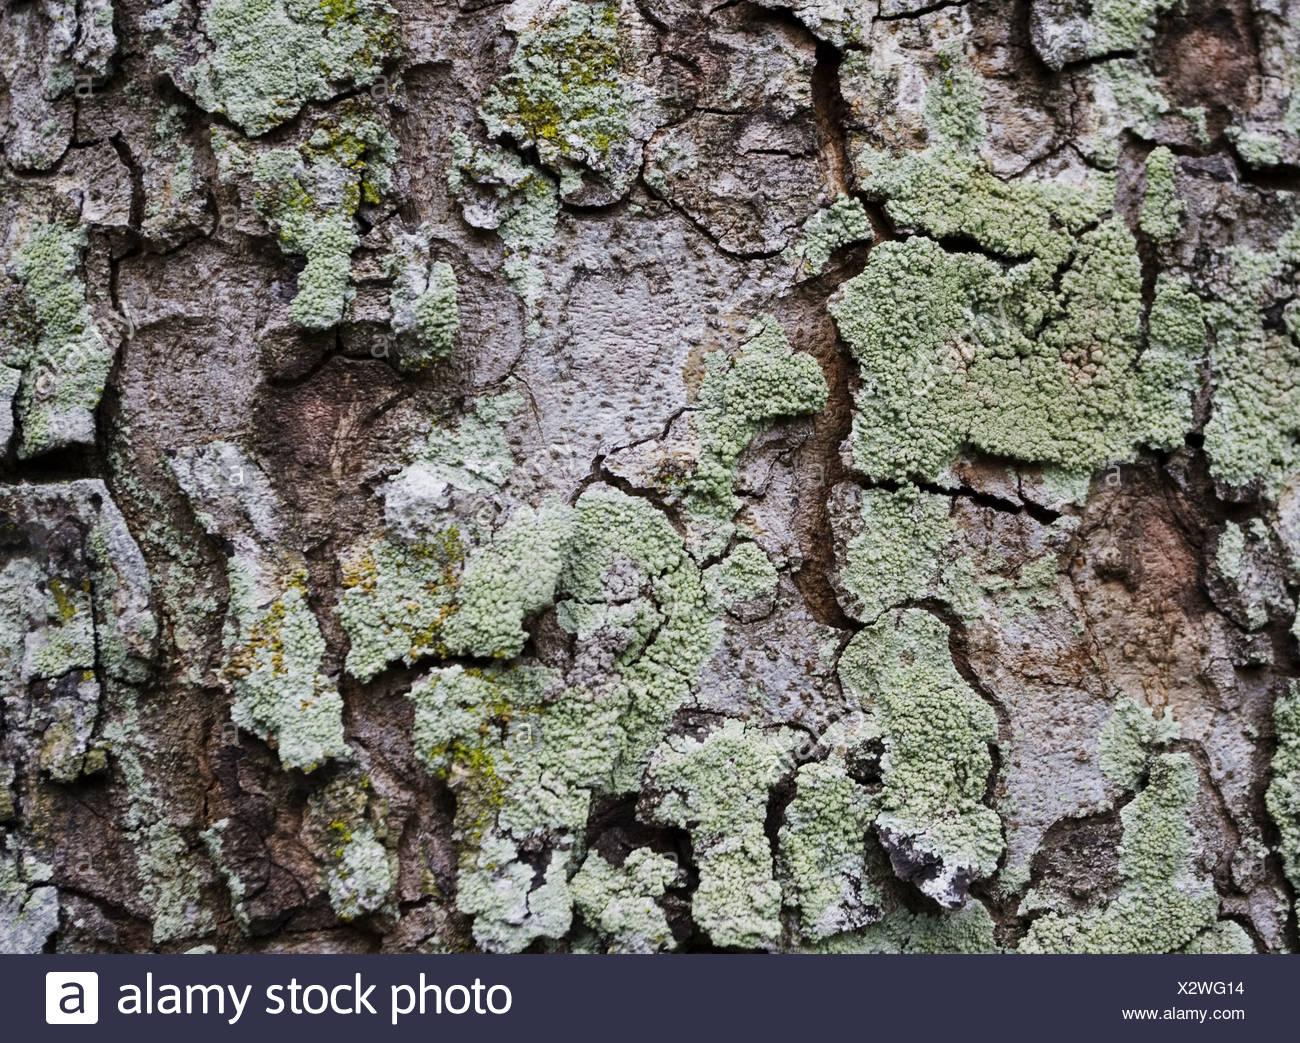 Close Up Oak Tree Trunk Stock Photos & Close Up Oak Tree Trunk Stock ...